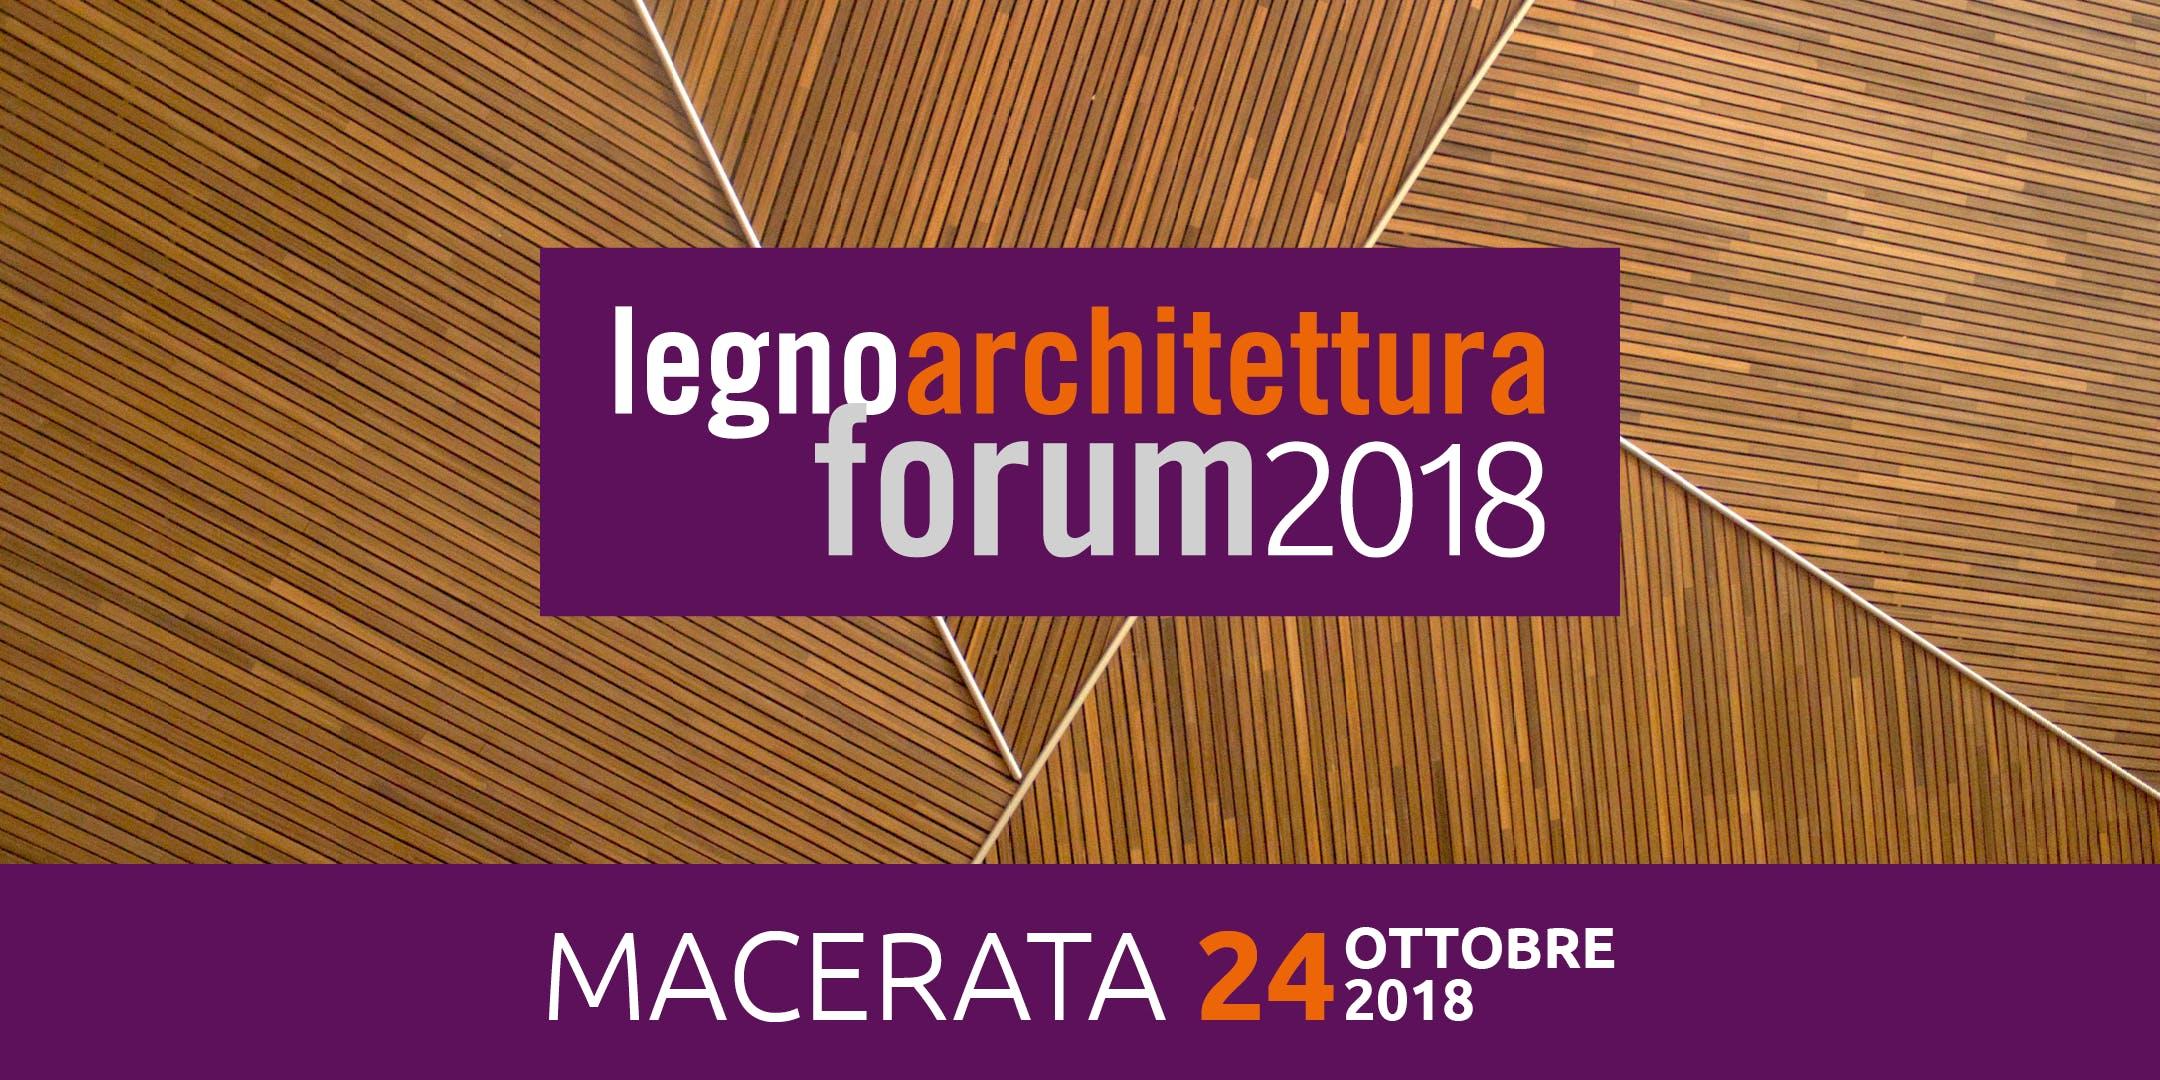 MACERATA - legnoarchitettura forum 2018